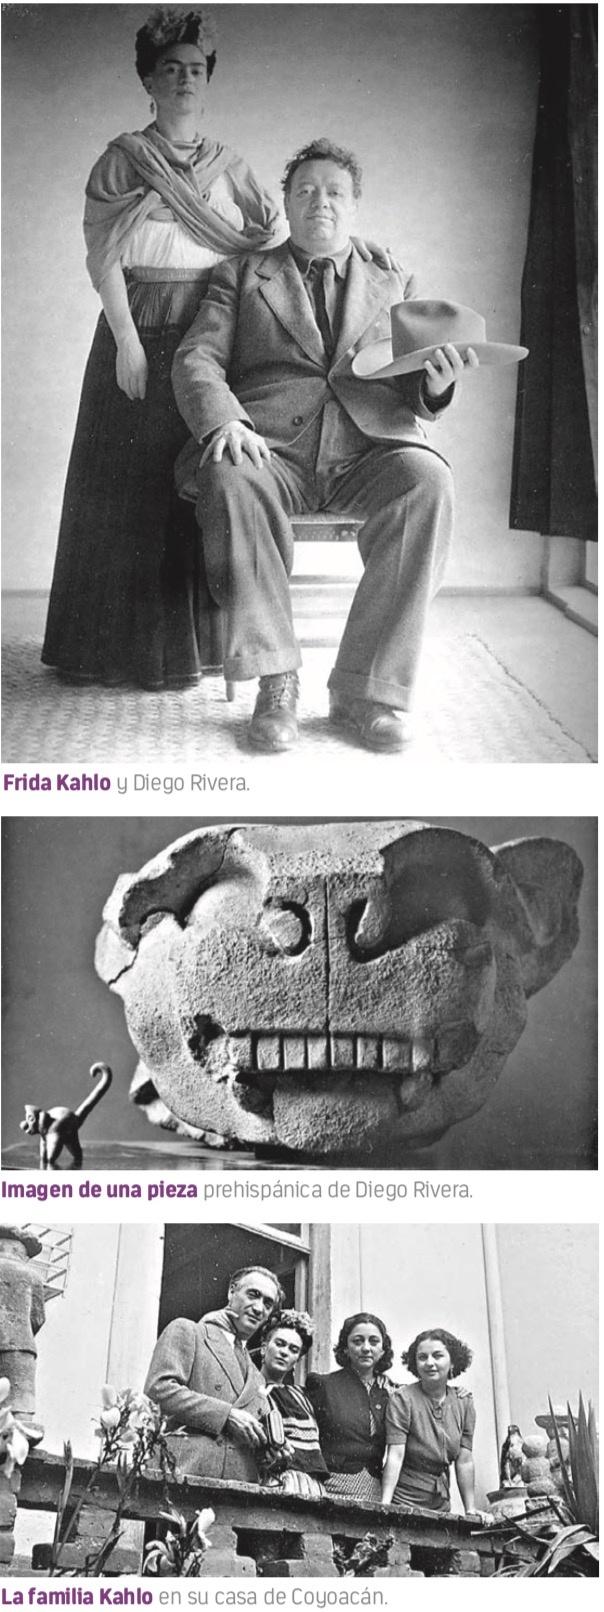 Subastan fotos inéditas de Frida hechas por amante